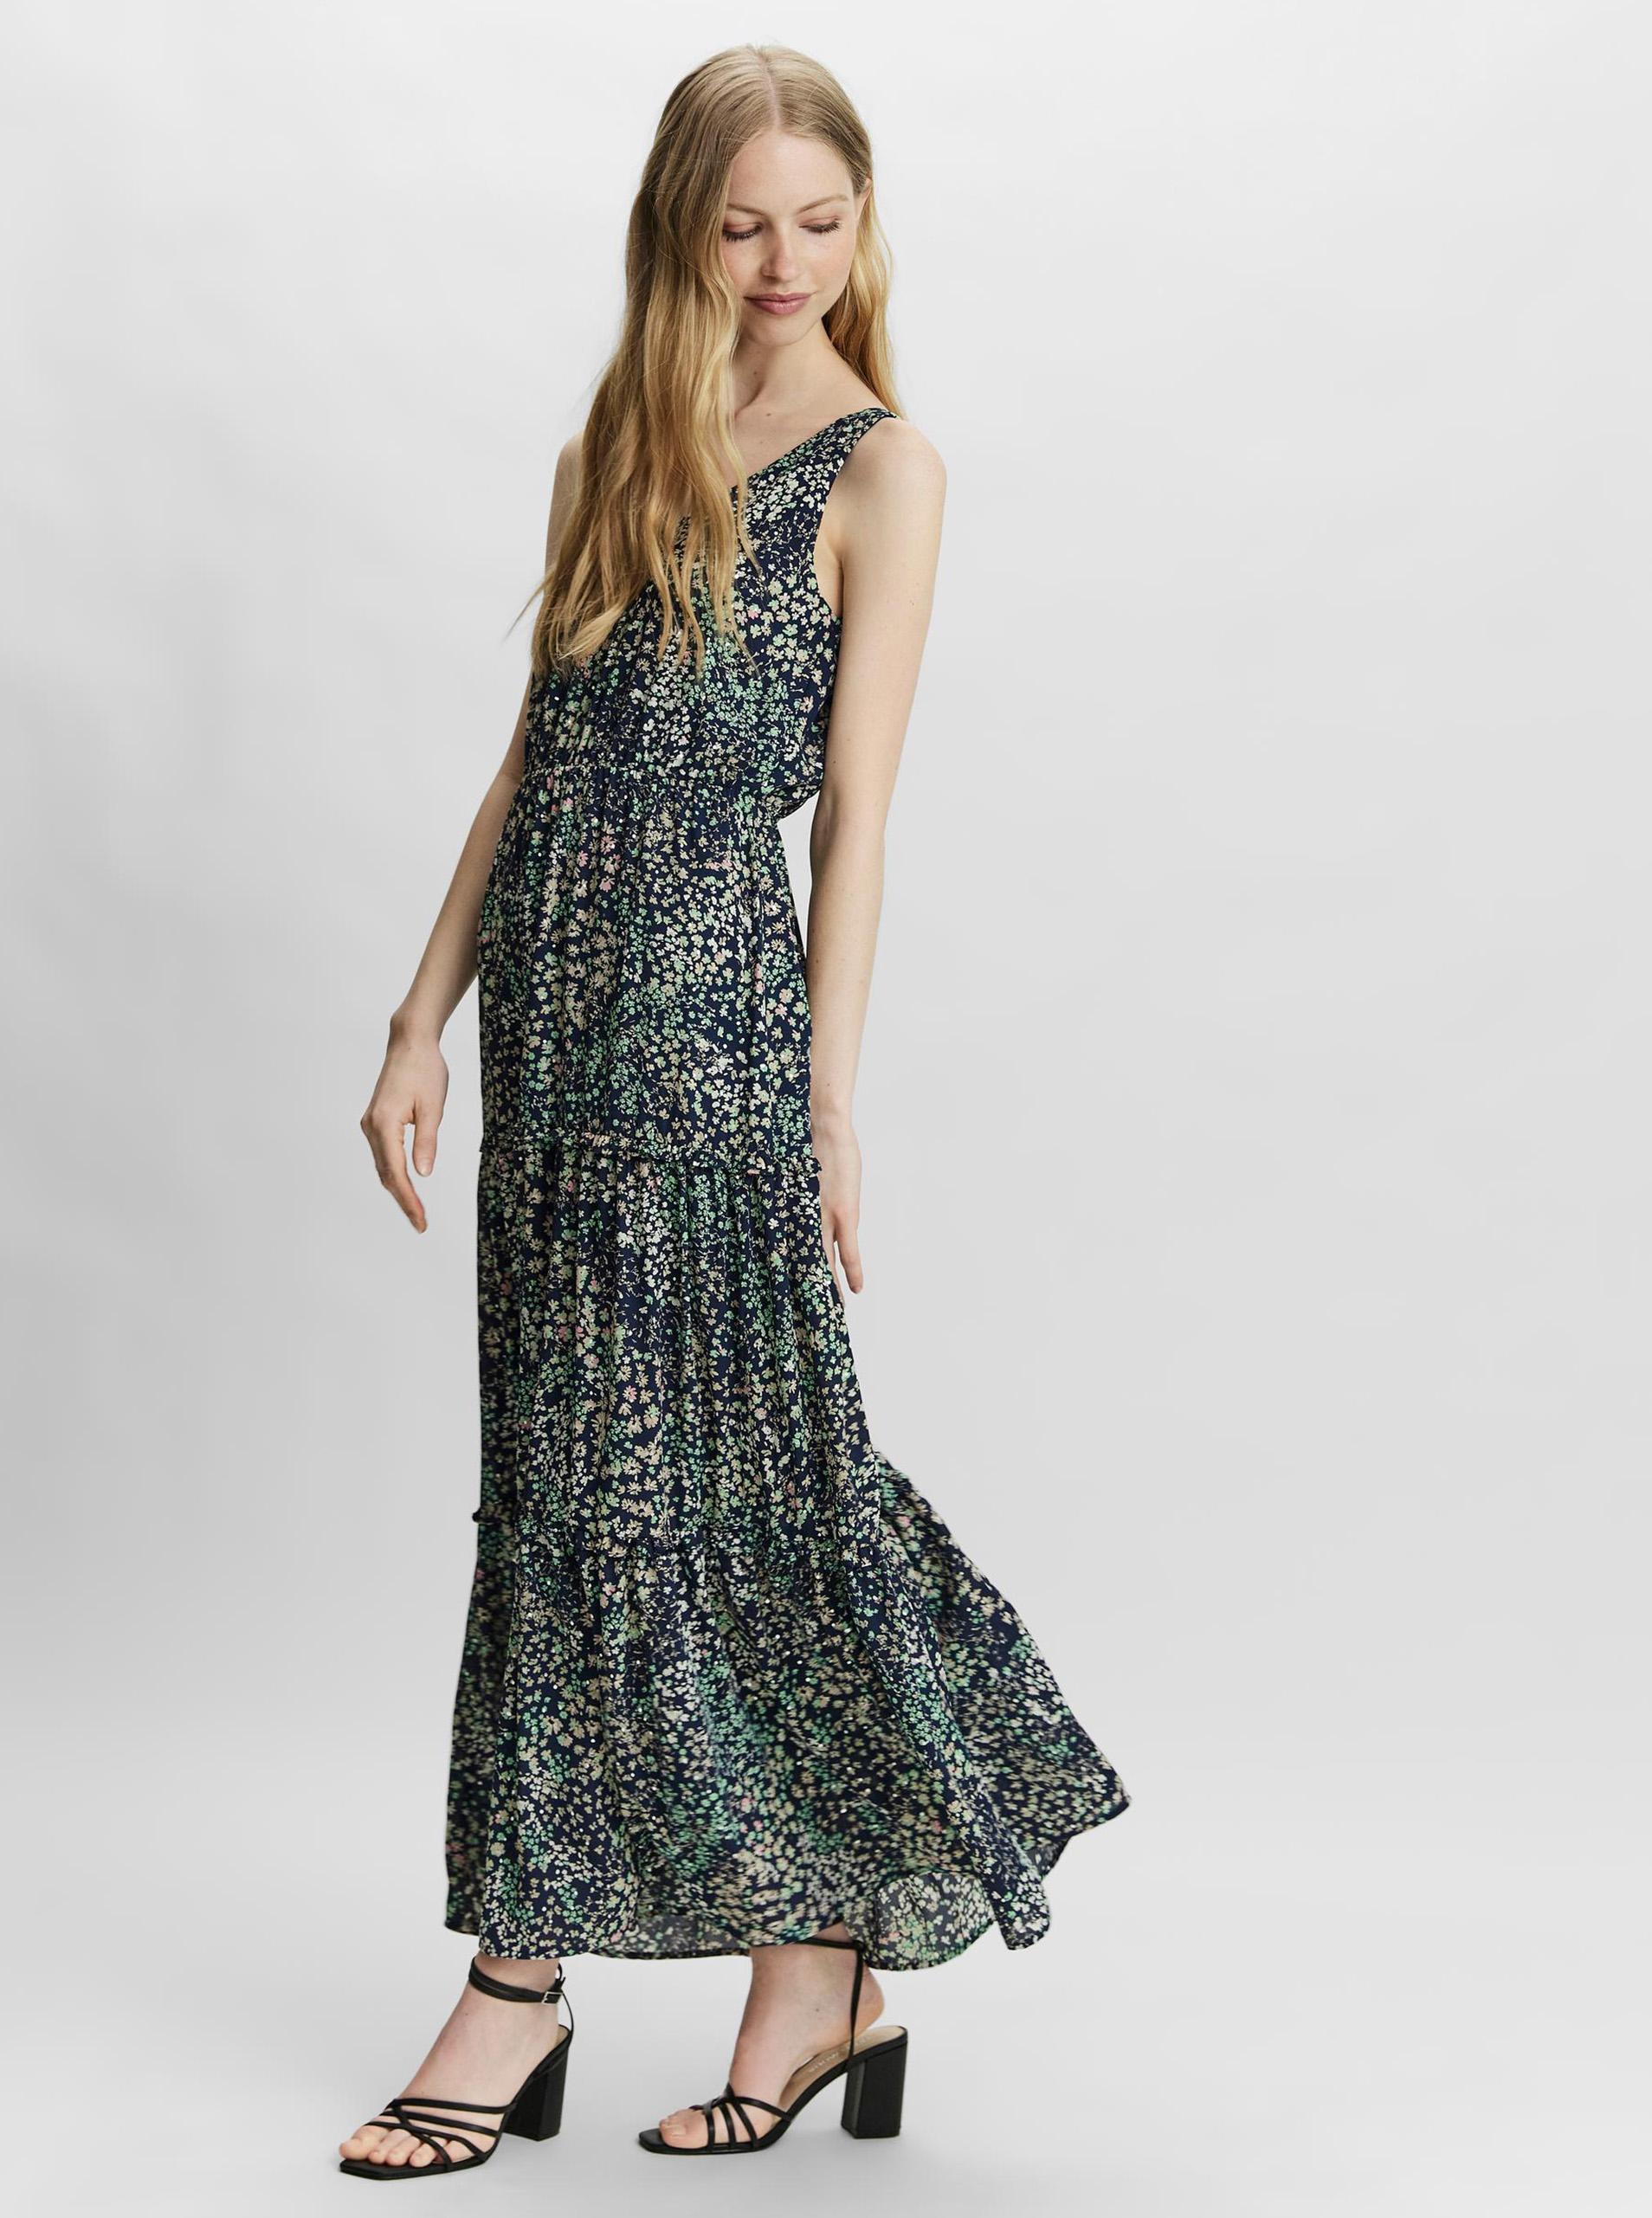 Vero Moda blue flowered maxi dress Hannah